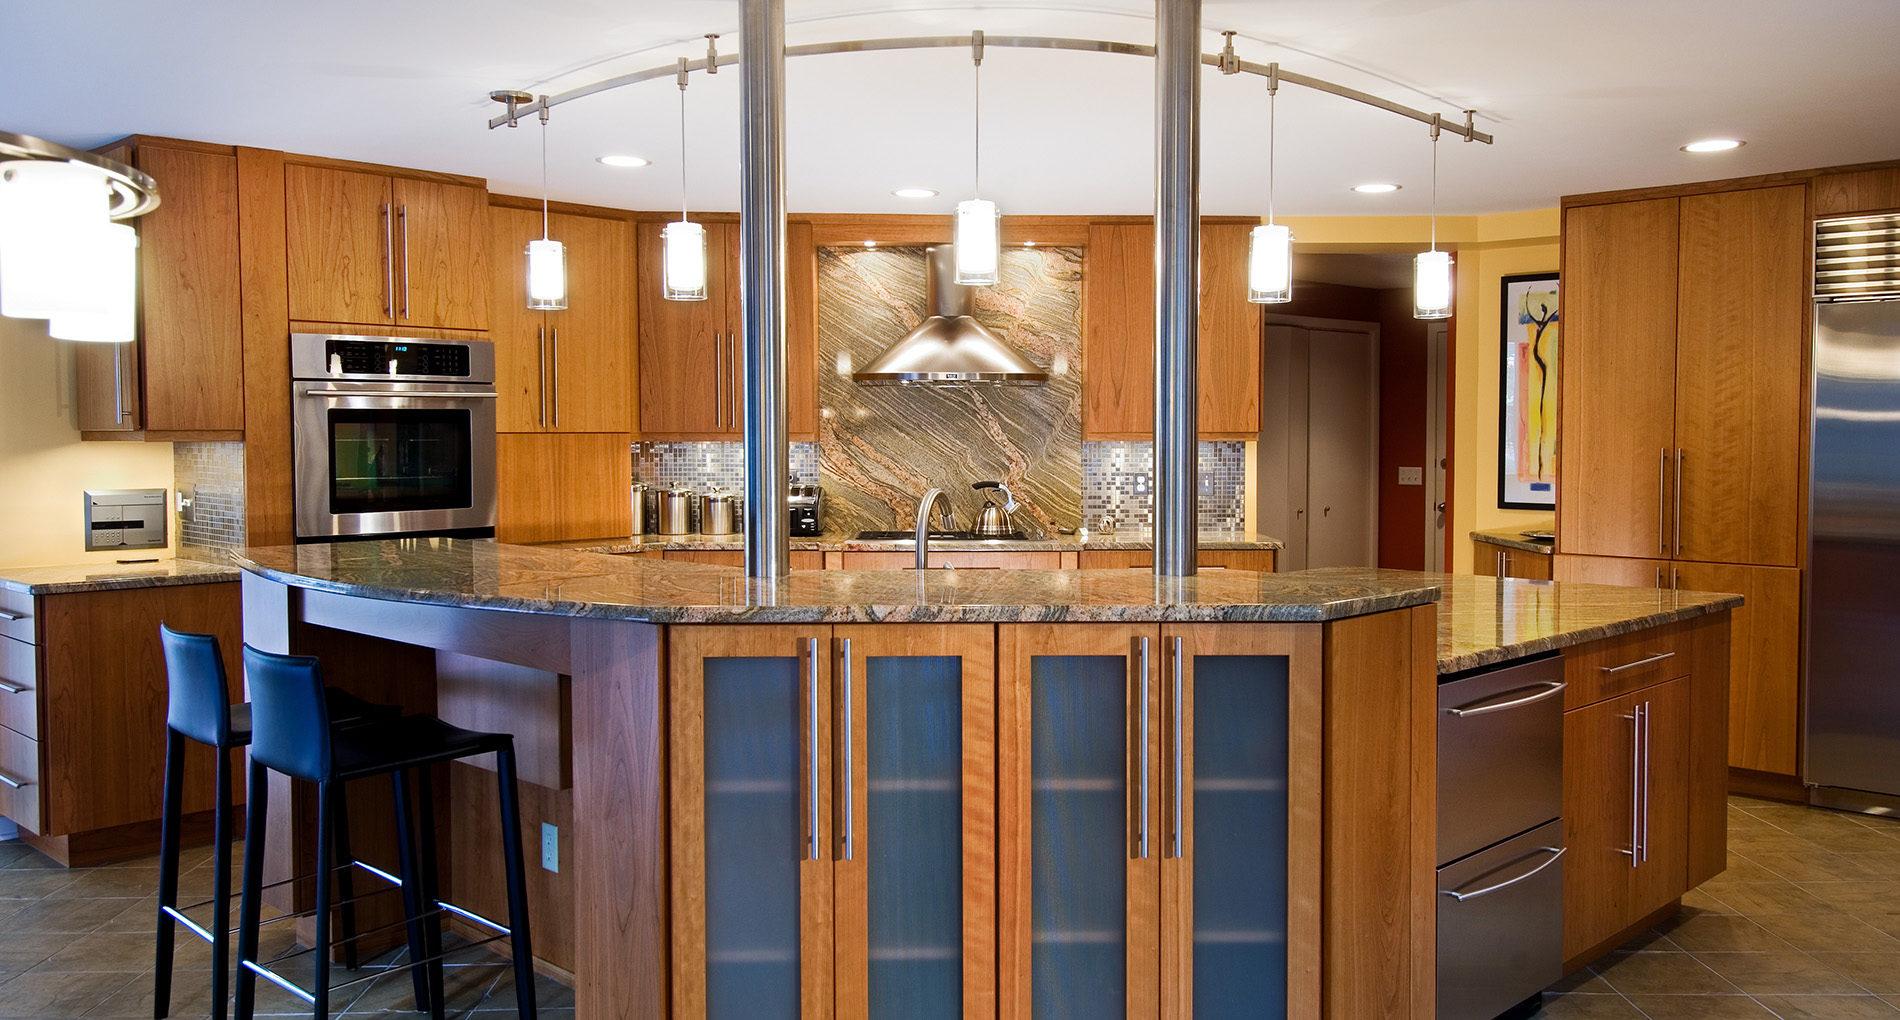 Kitchen Remodel Cuyahogafalls Morelandhills Slider